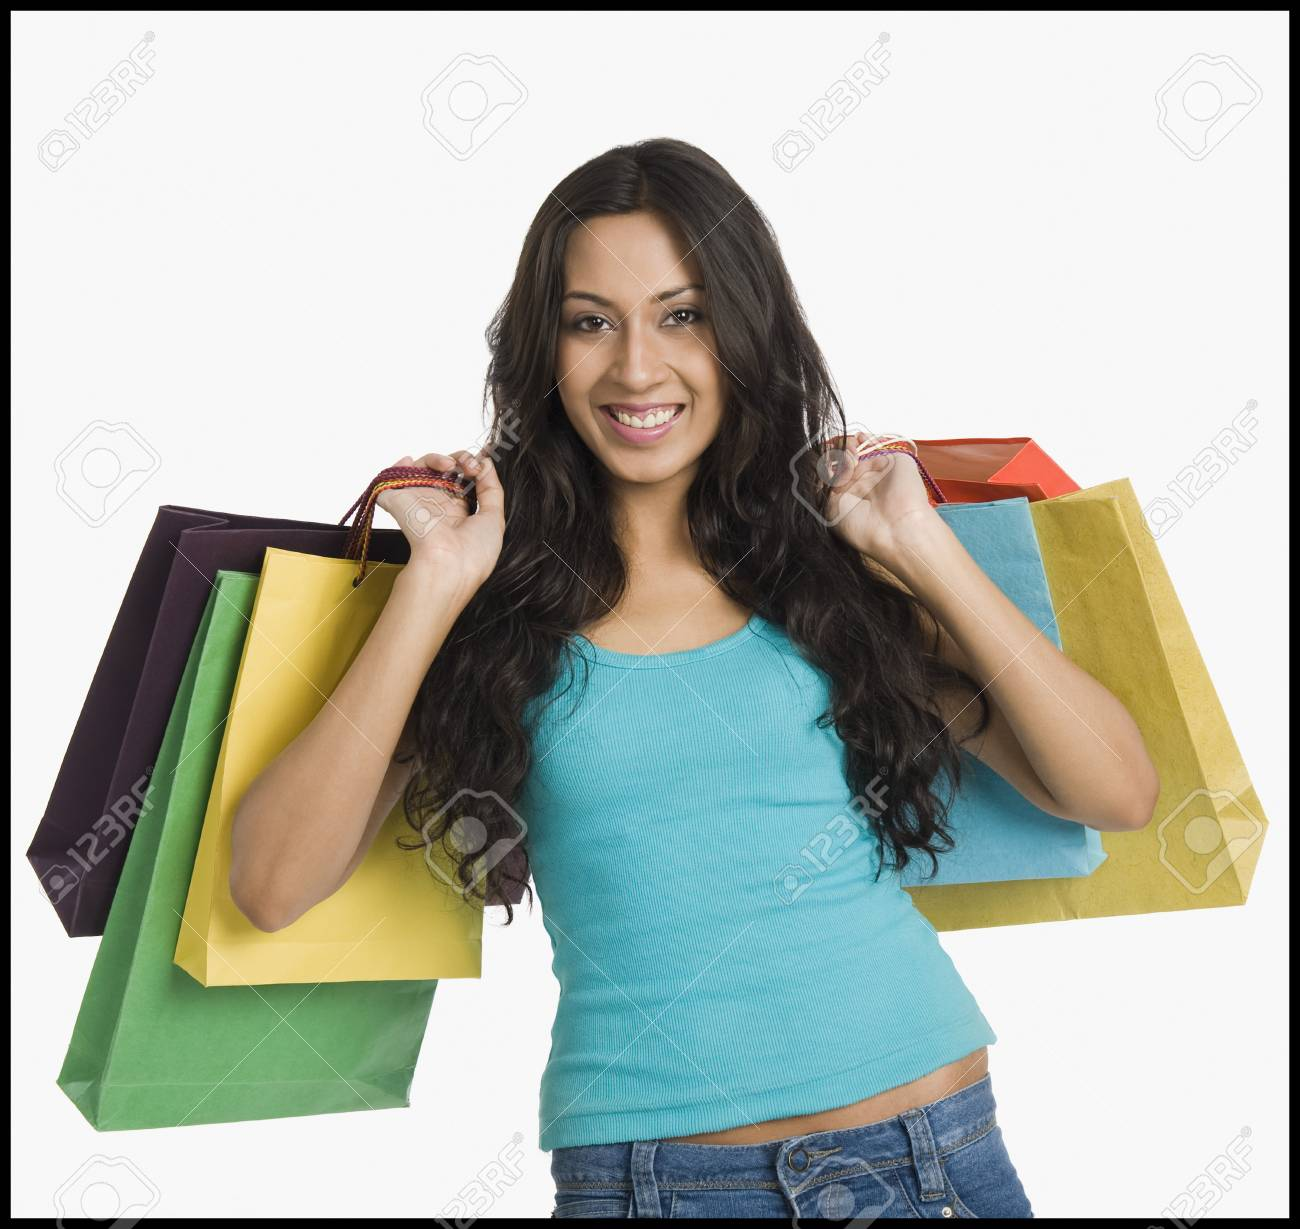 Woman carrying shopping bags Stock Photo - 10166248